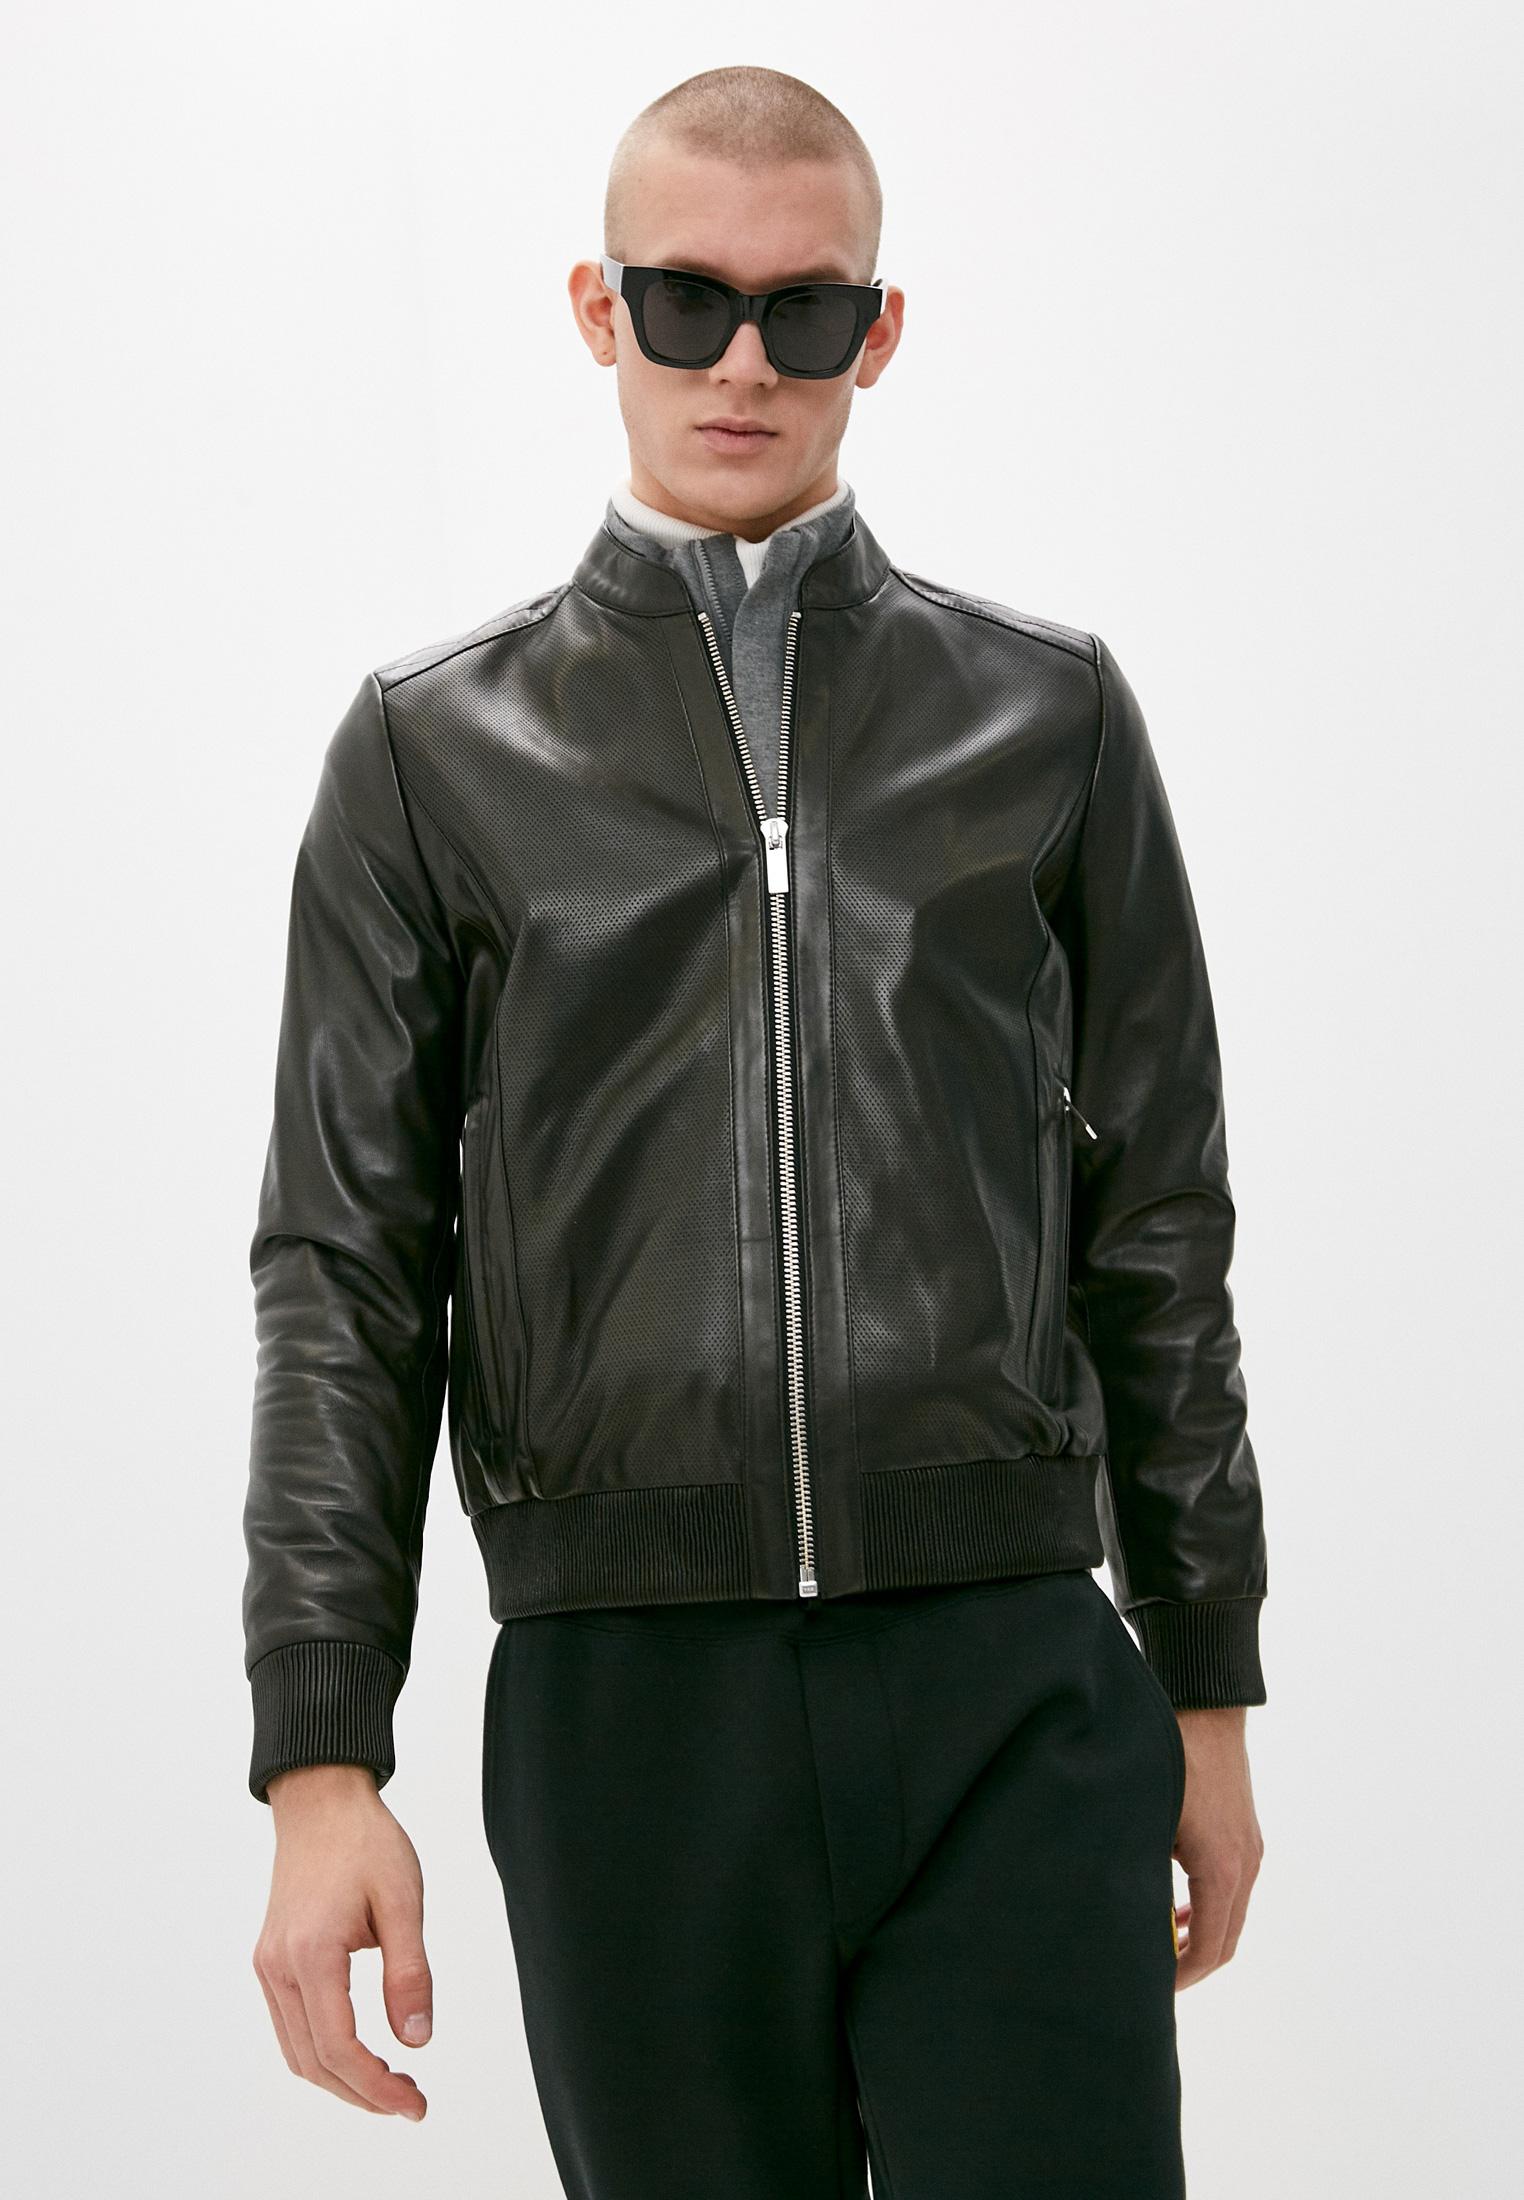 Кожаная куртка Karl Lagerfeld (Карл Лагерфельд) 555004 511400